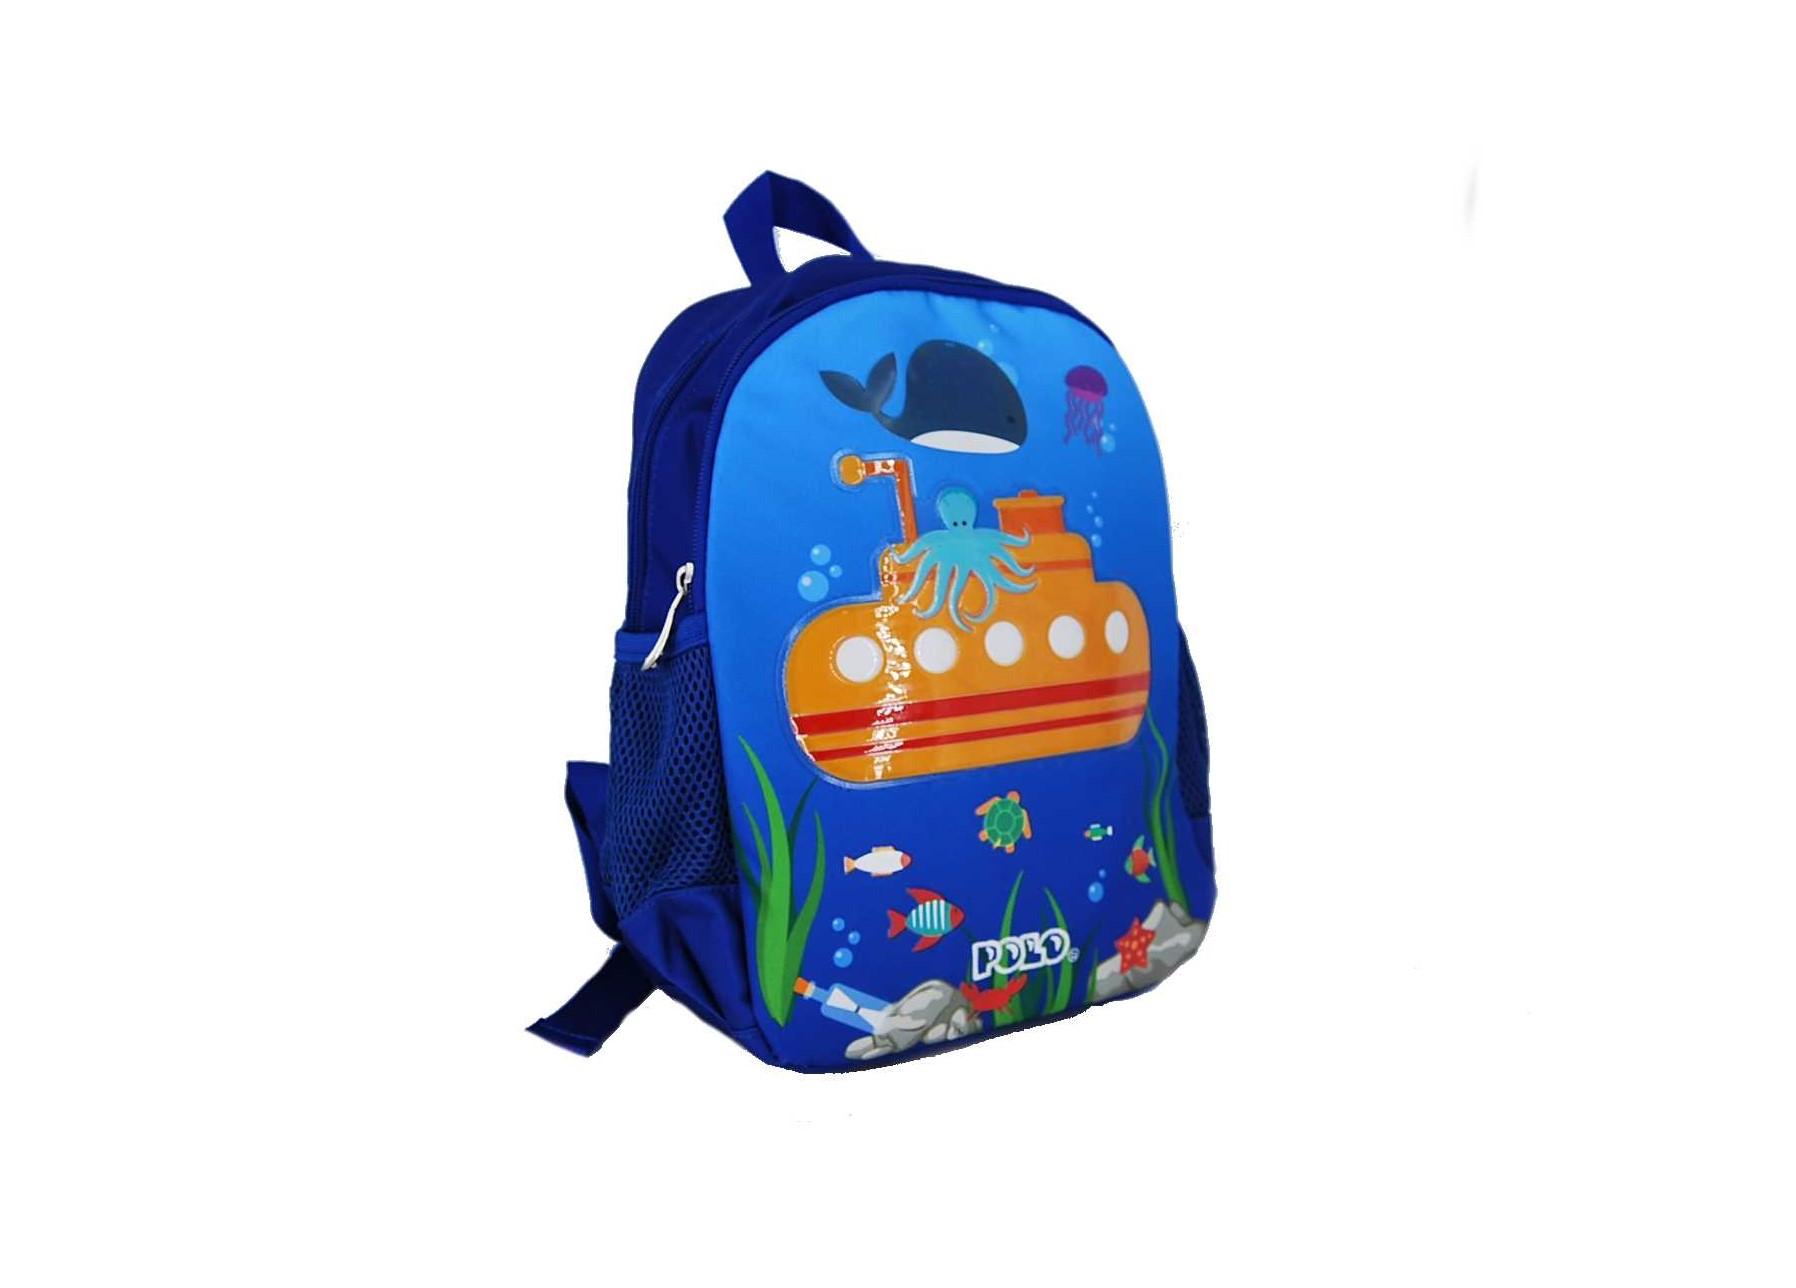 e63f82cf0e8 Polo παιδική τσάντα βυθός | Εισαγωγική Accessories